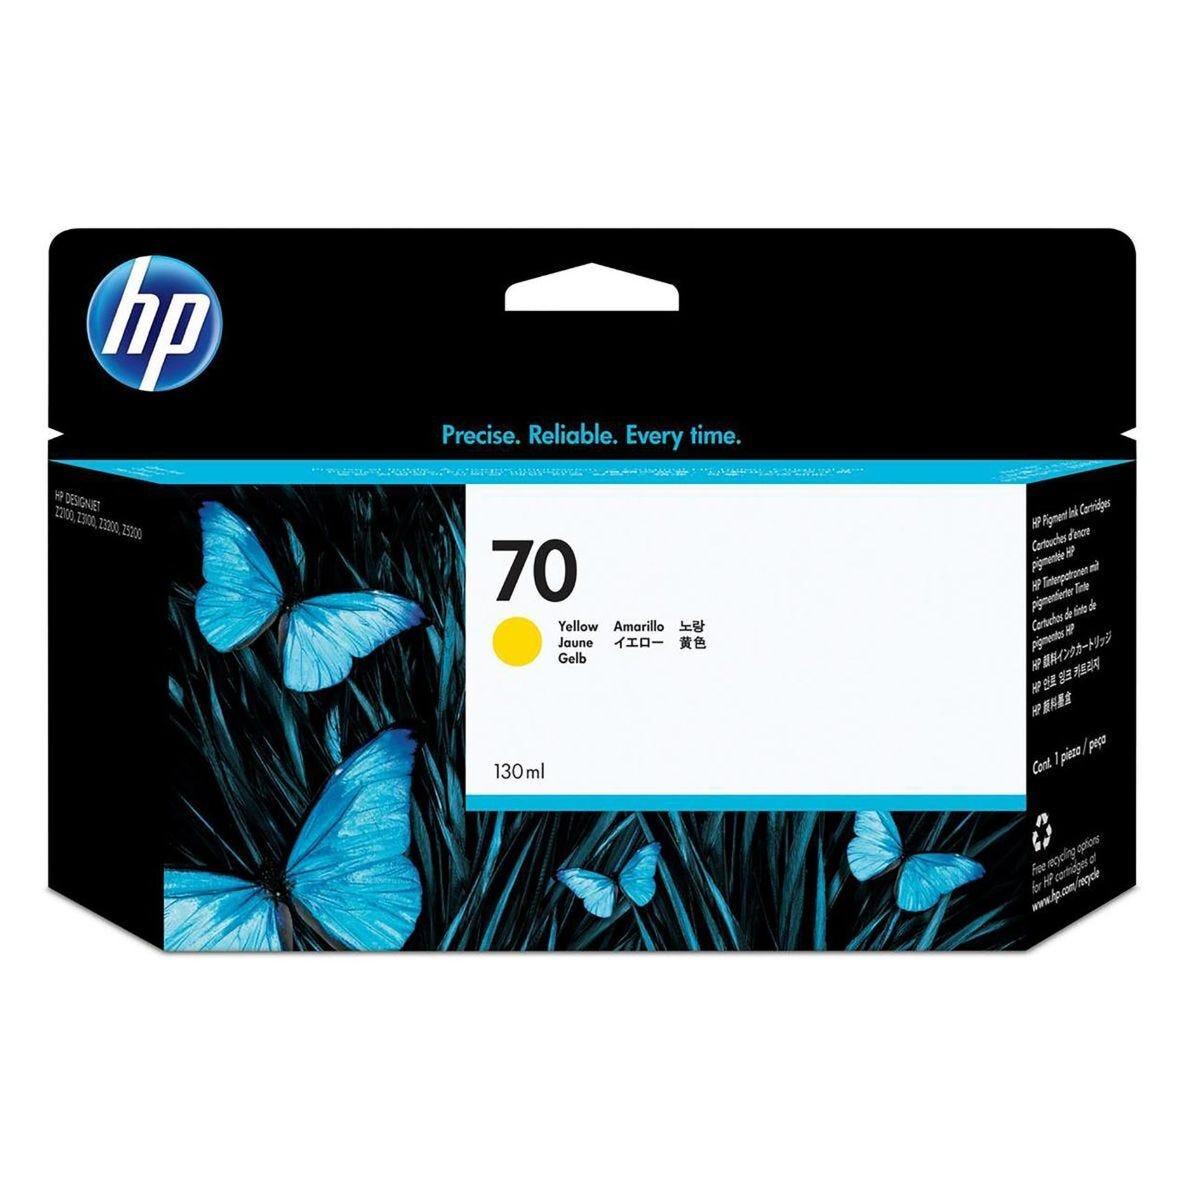 HP 70 Inkjet Cartridge Yellow